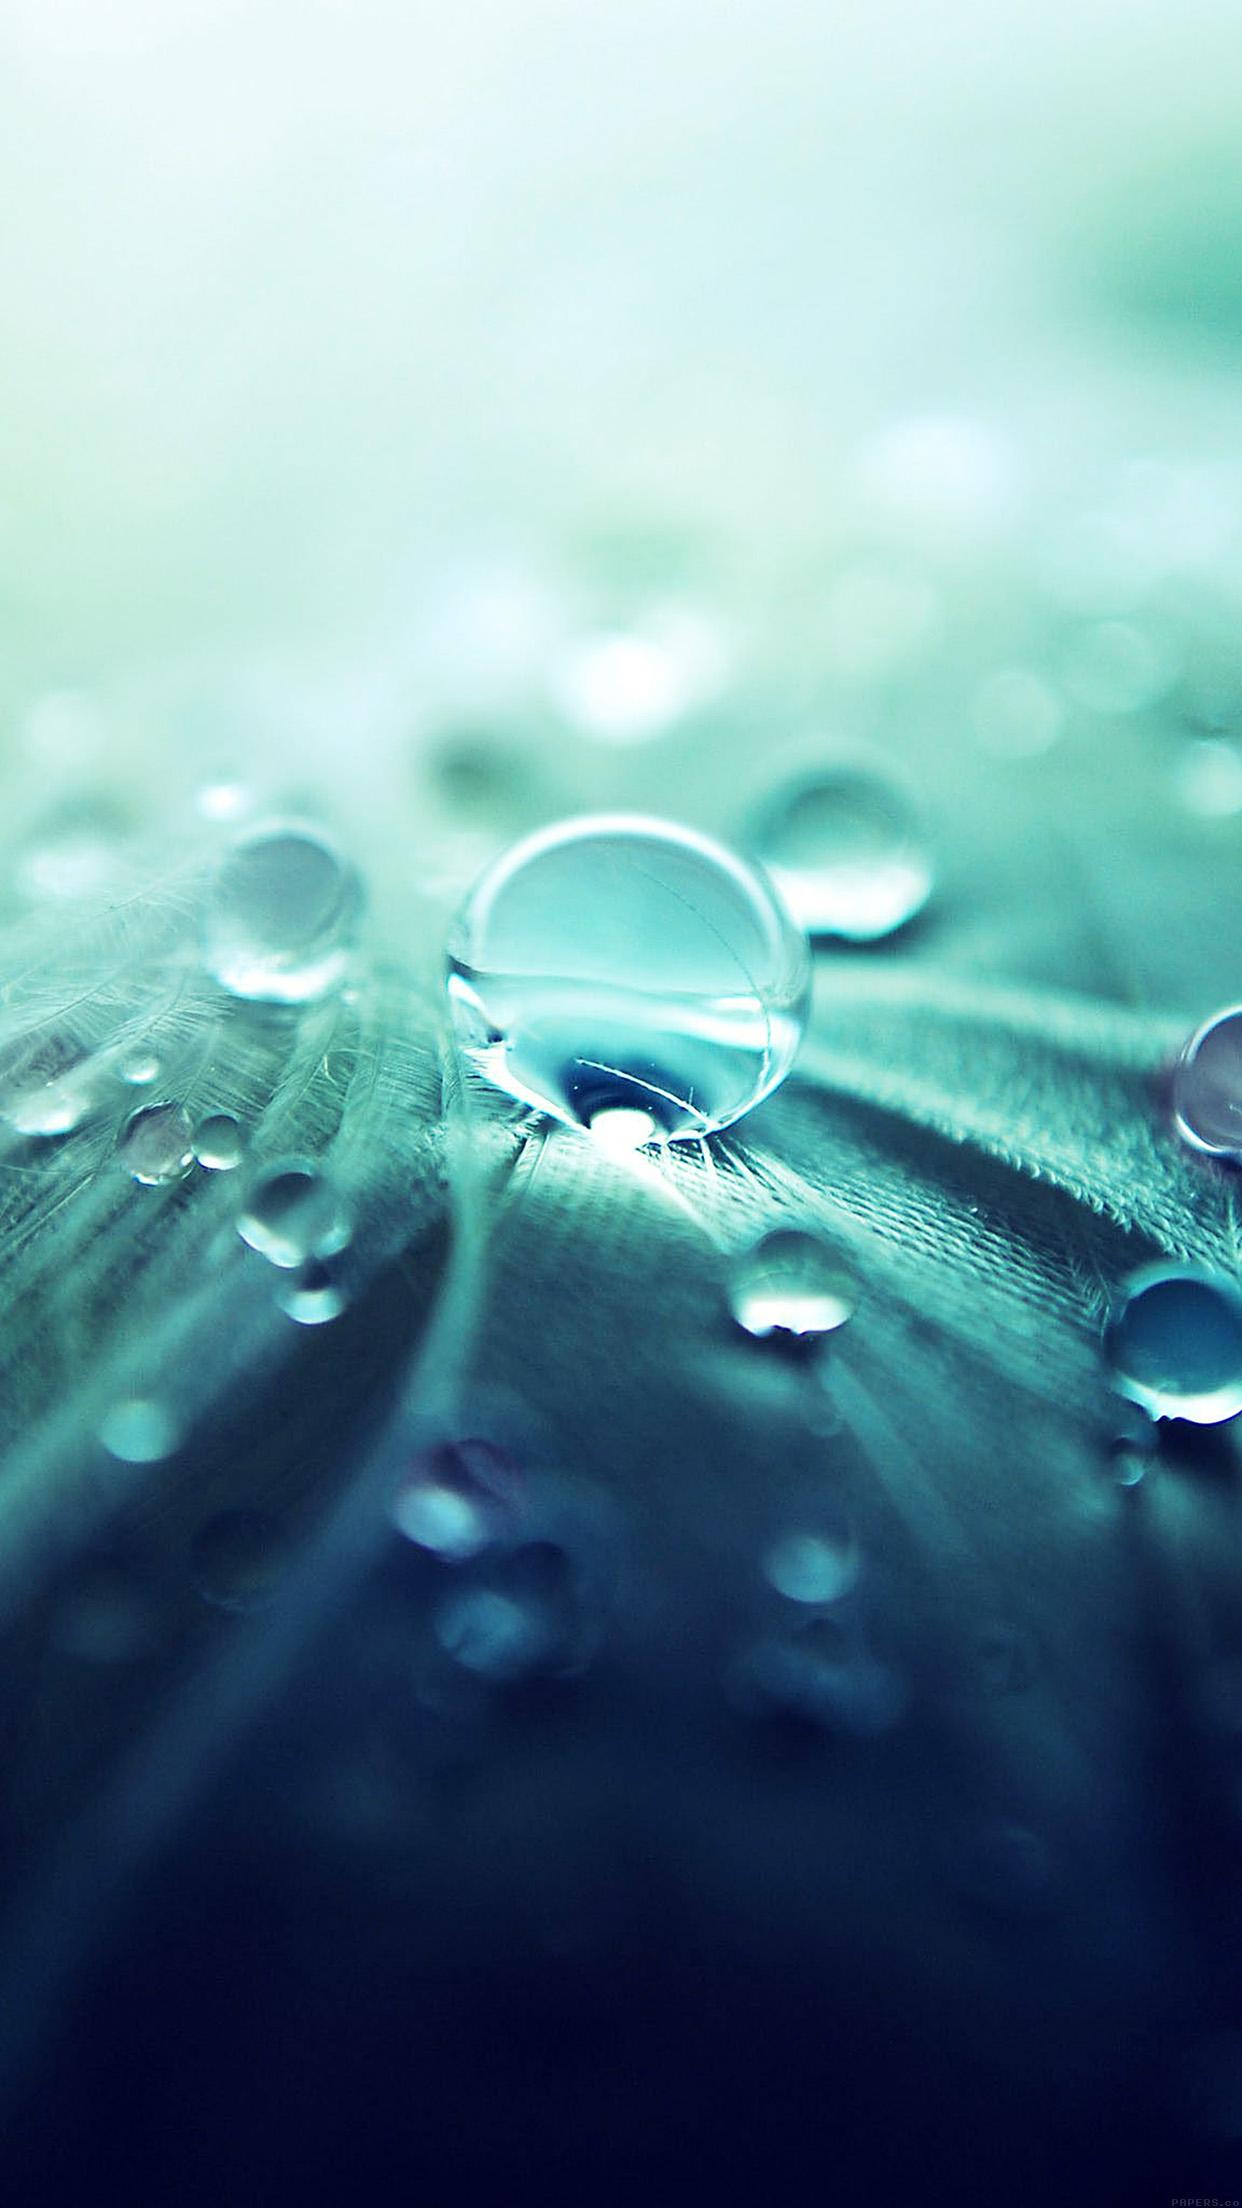 Iphone6paperscom Iphone 6 Wallpaper Ml54 Raindrops Nature Leaf